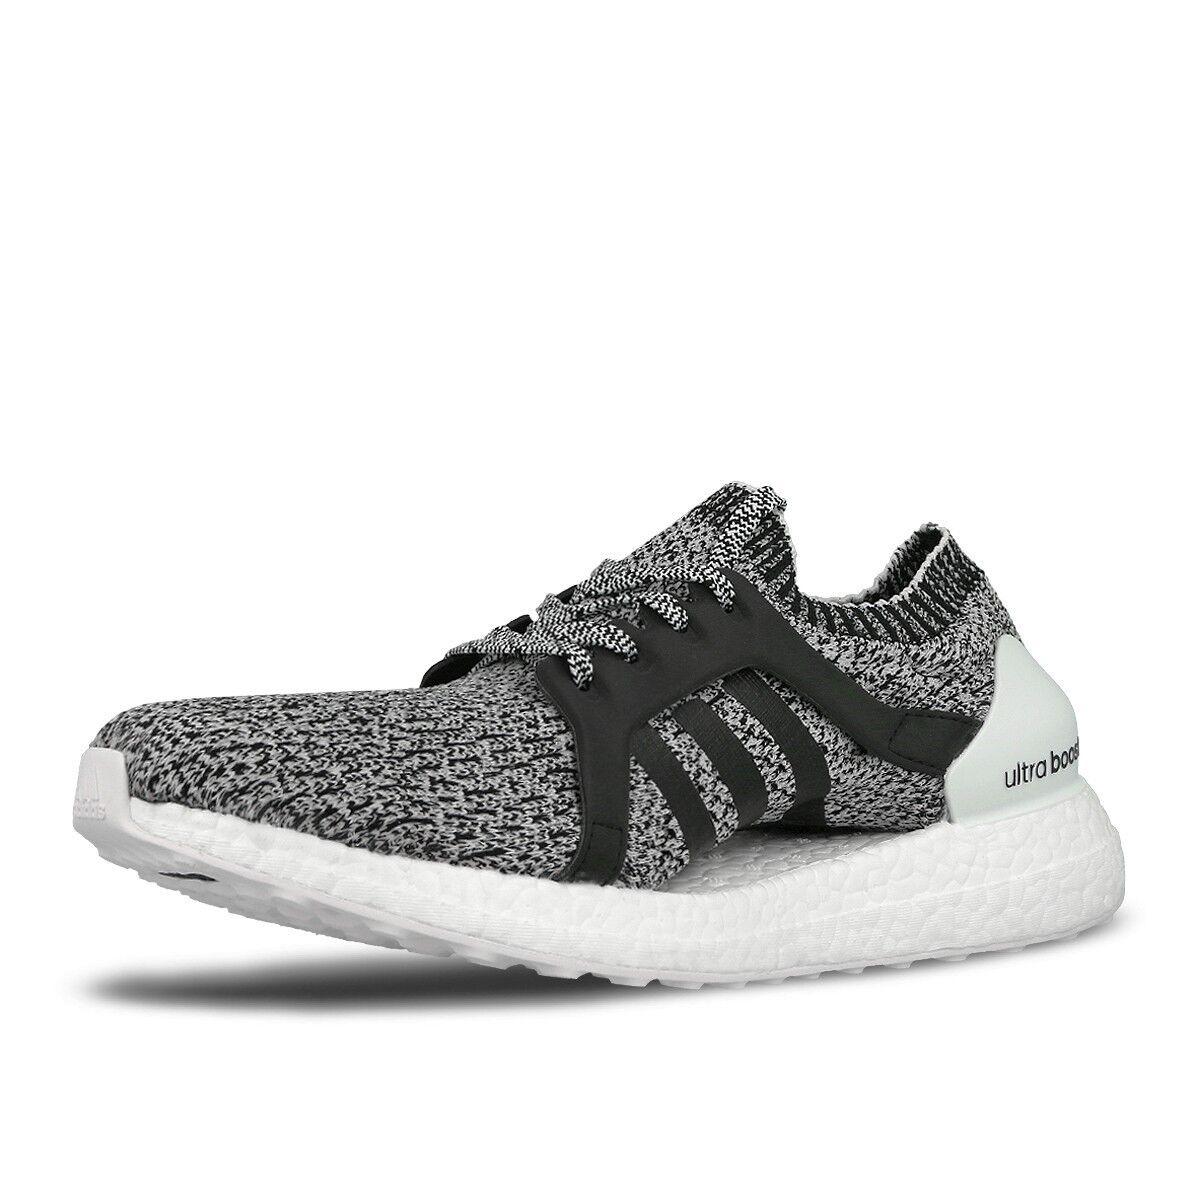 ff48d11f8 Buy adidas Ultraboost X Running Shoes WMNS Sz 5.5 Black White Primeknit  Cg2977 online